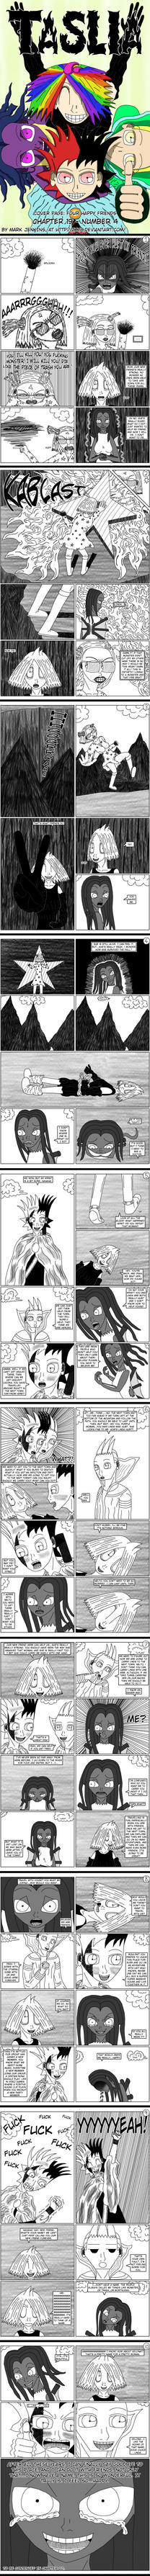 Taslia comic - Chapter 19, by ZXY8 by zxy8